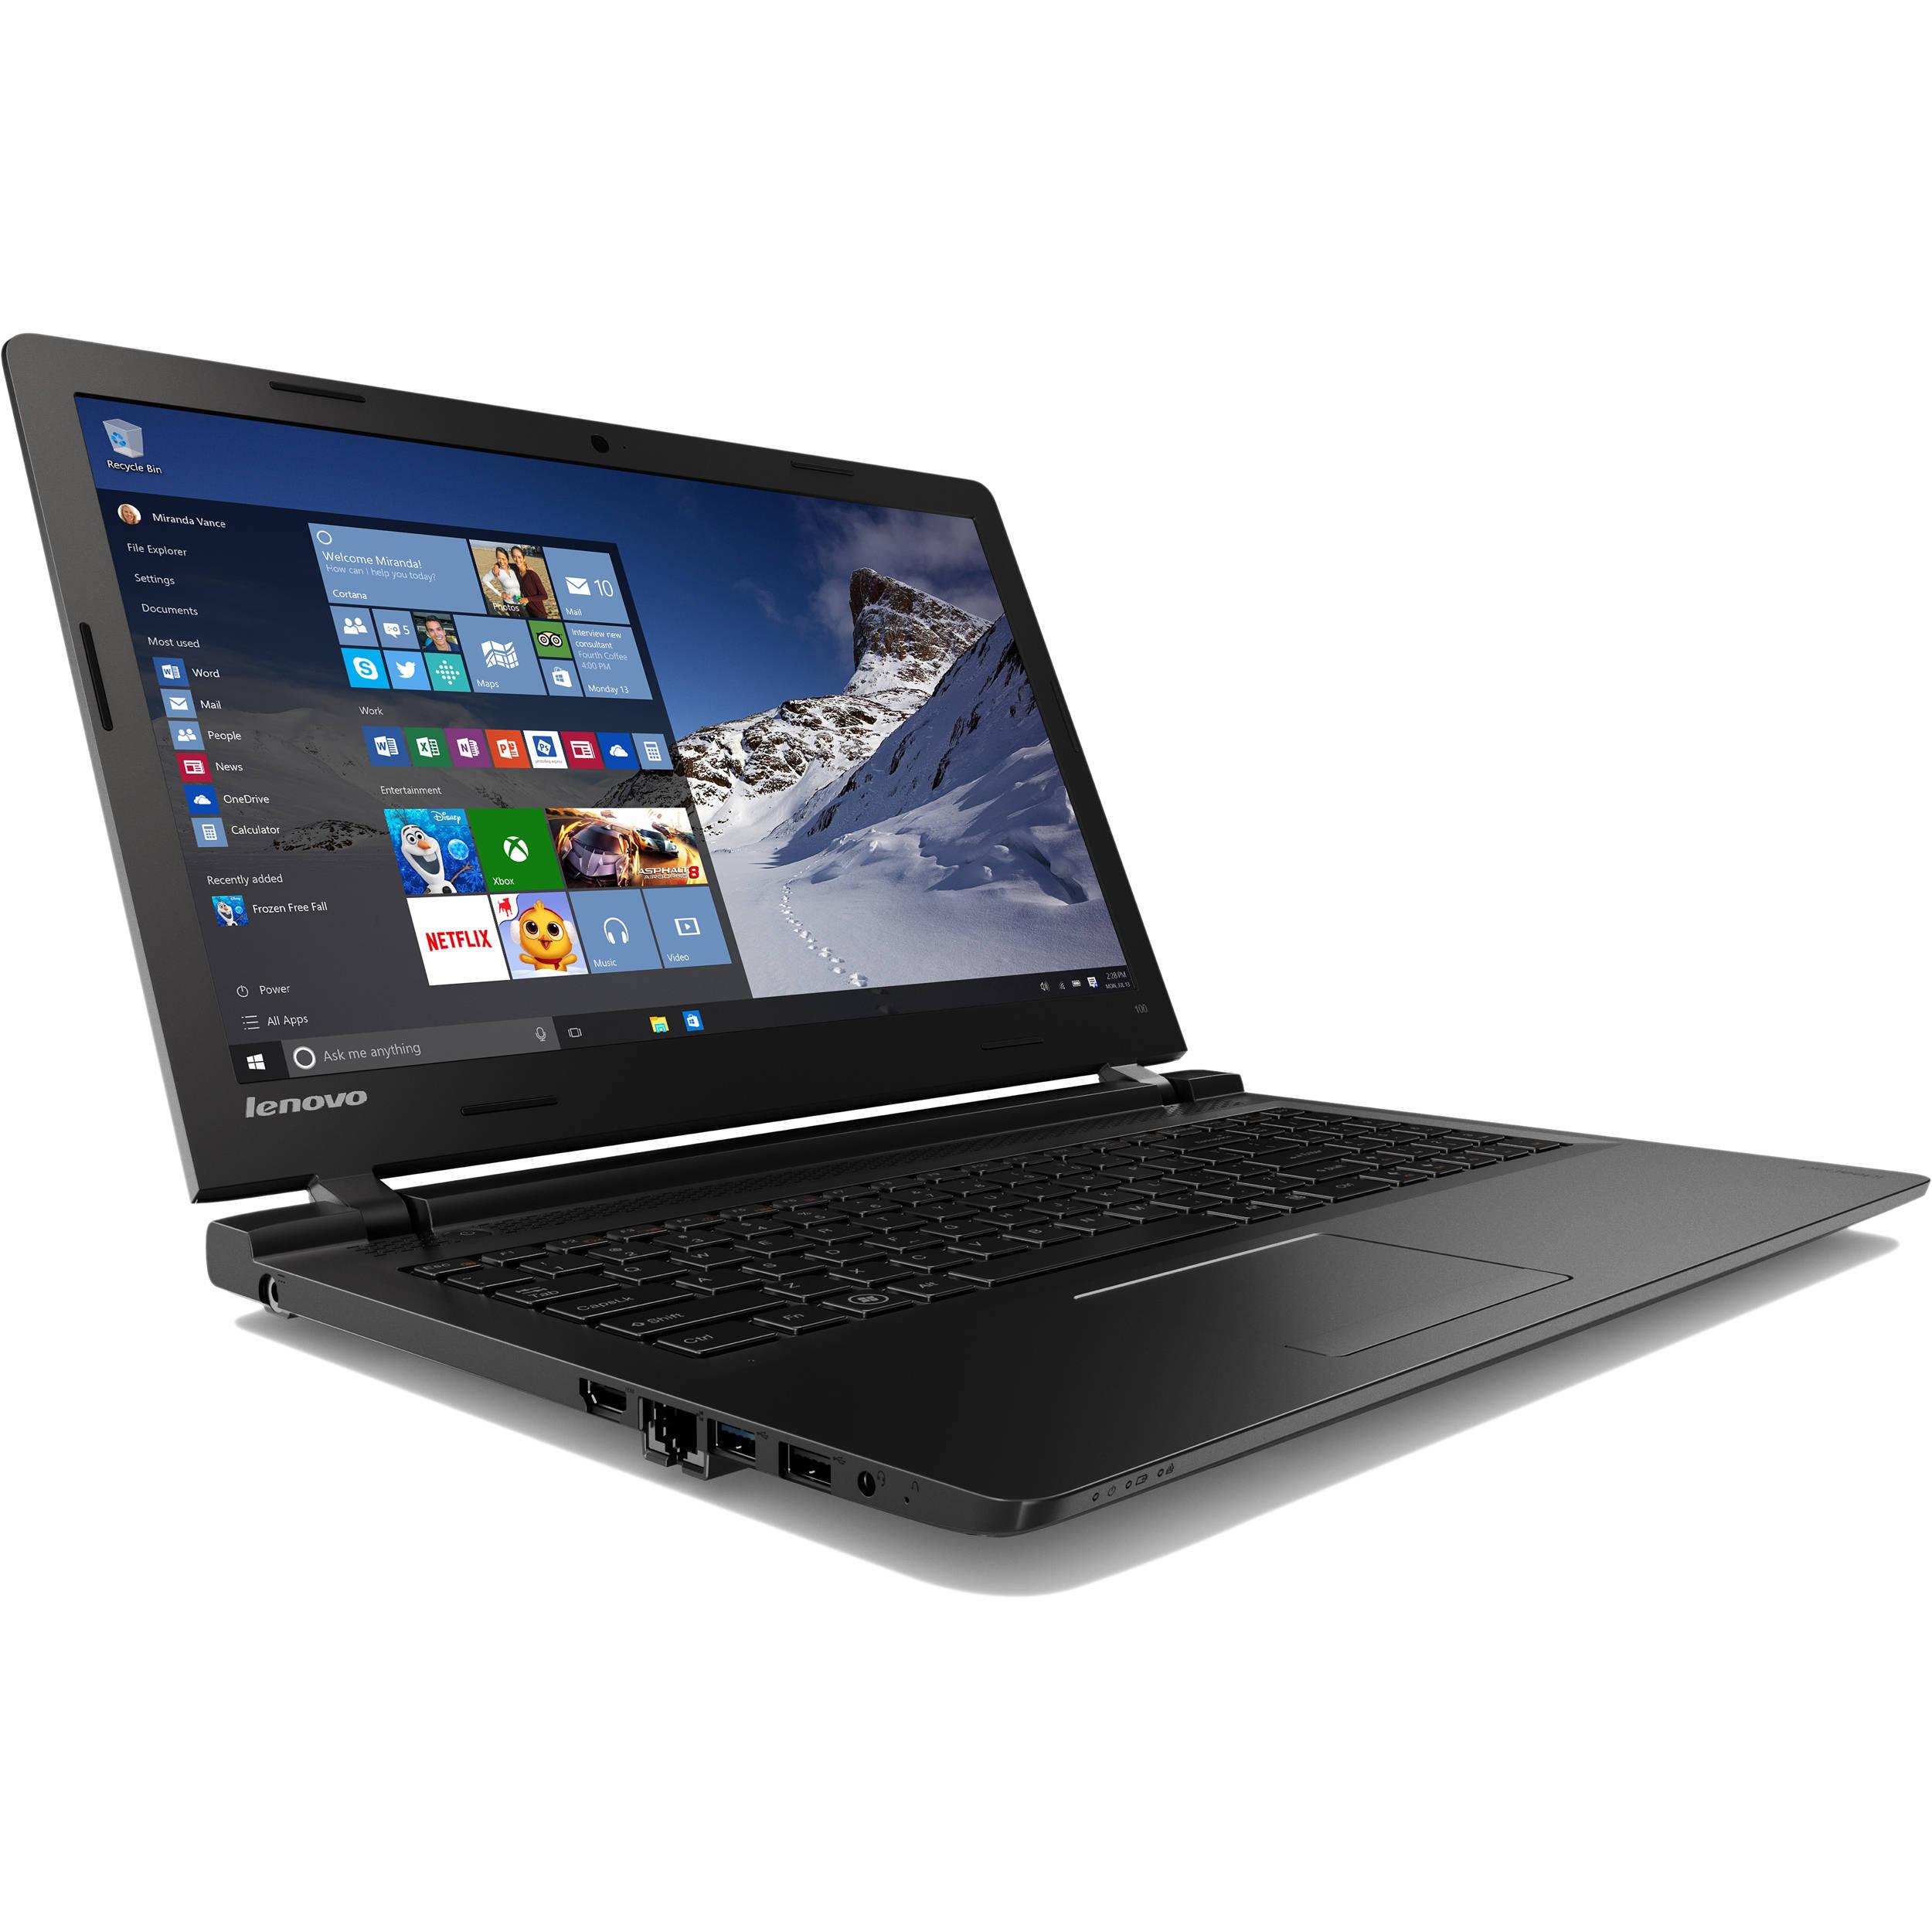 elgiganten dator windows 7